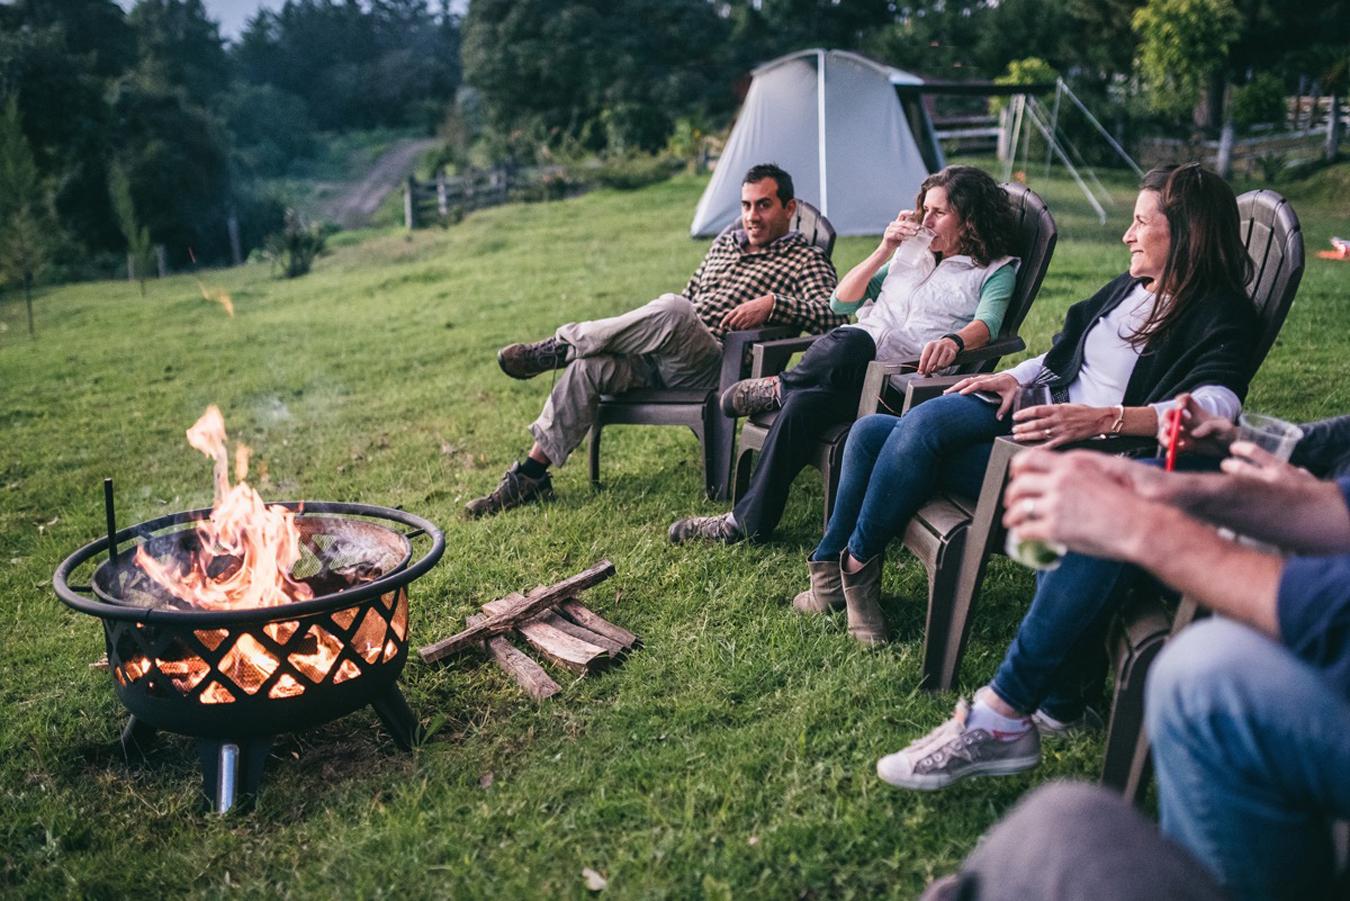 AntiguaGlamping#09 - Campfire.jpg